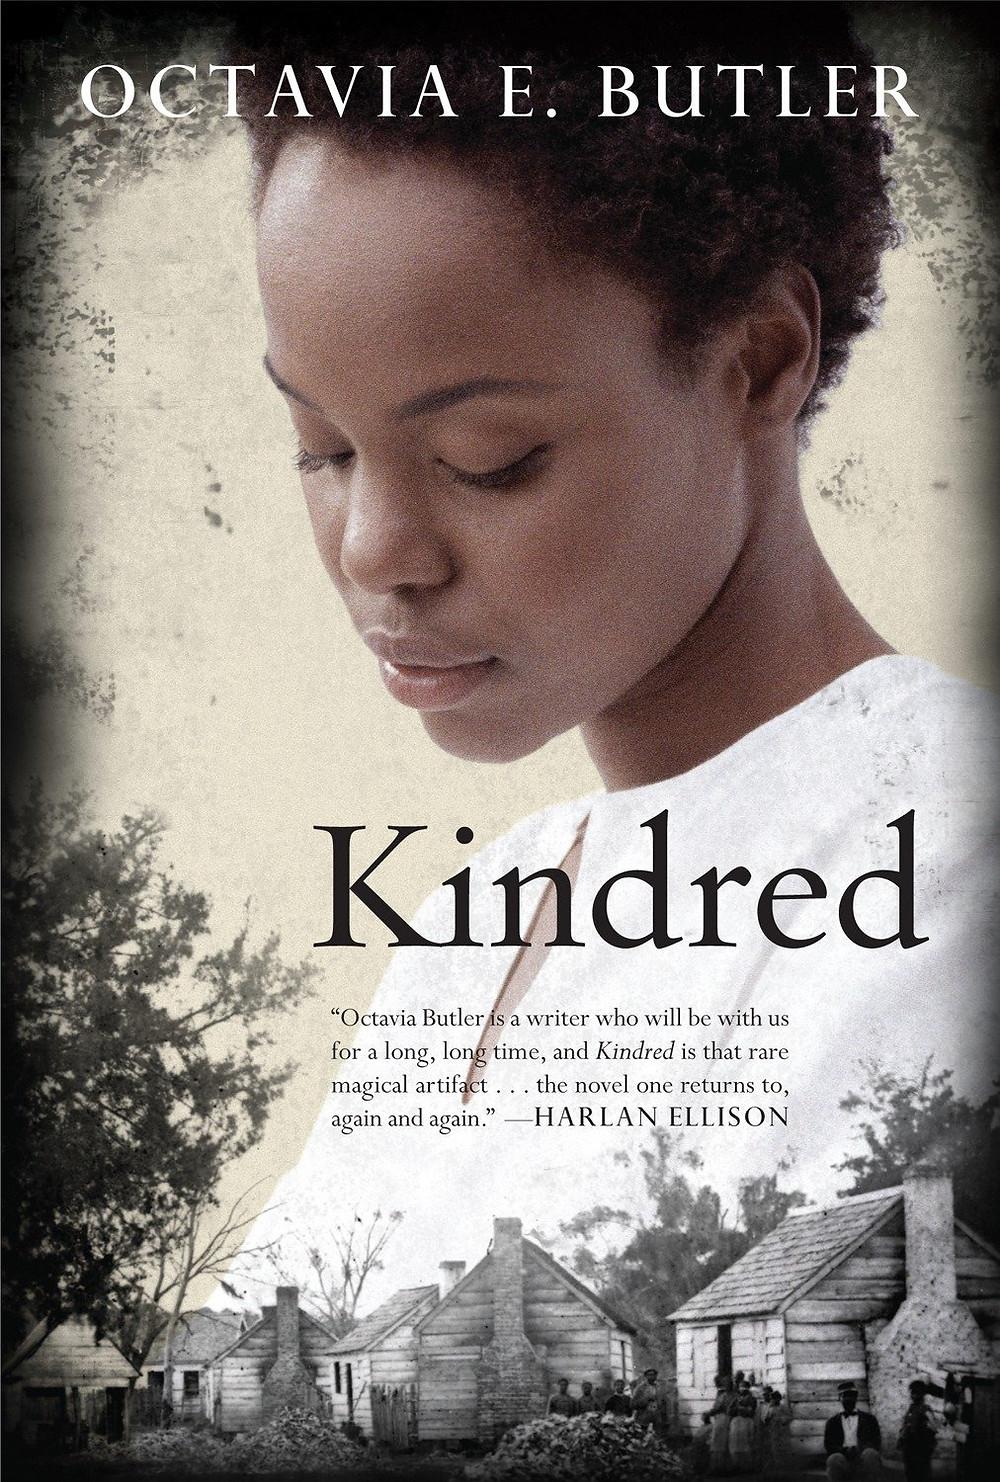 Kindred's Beacon Press, paperback cover art.